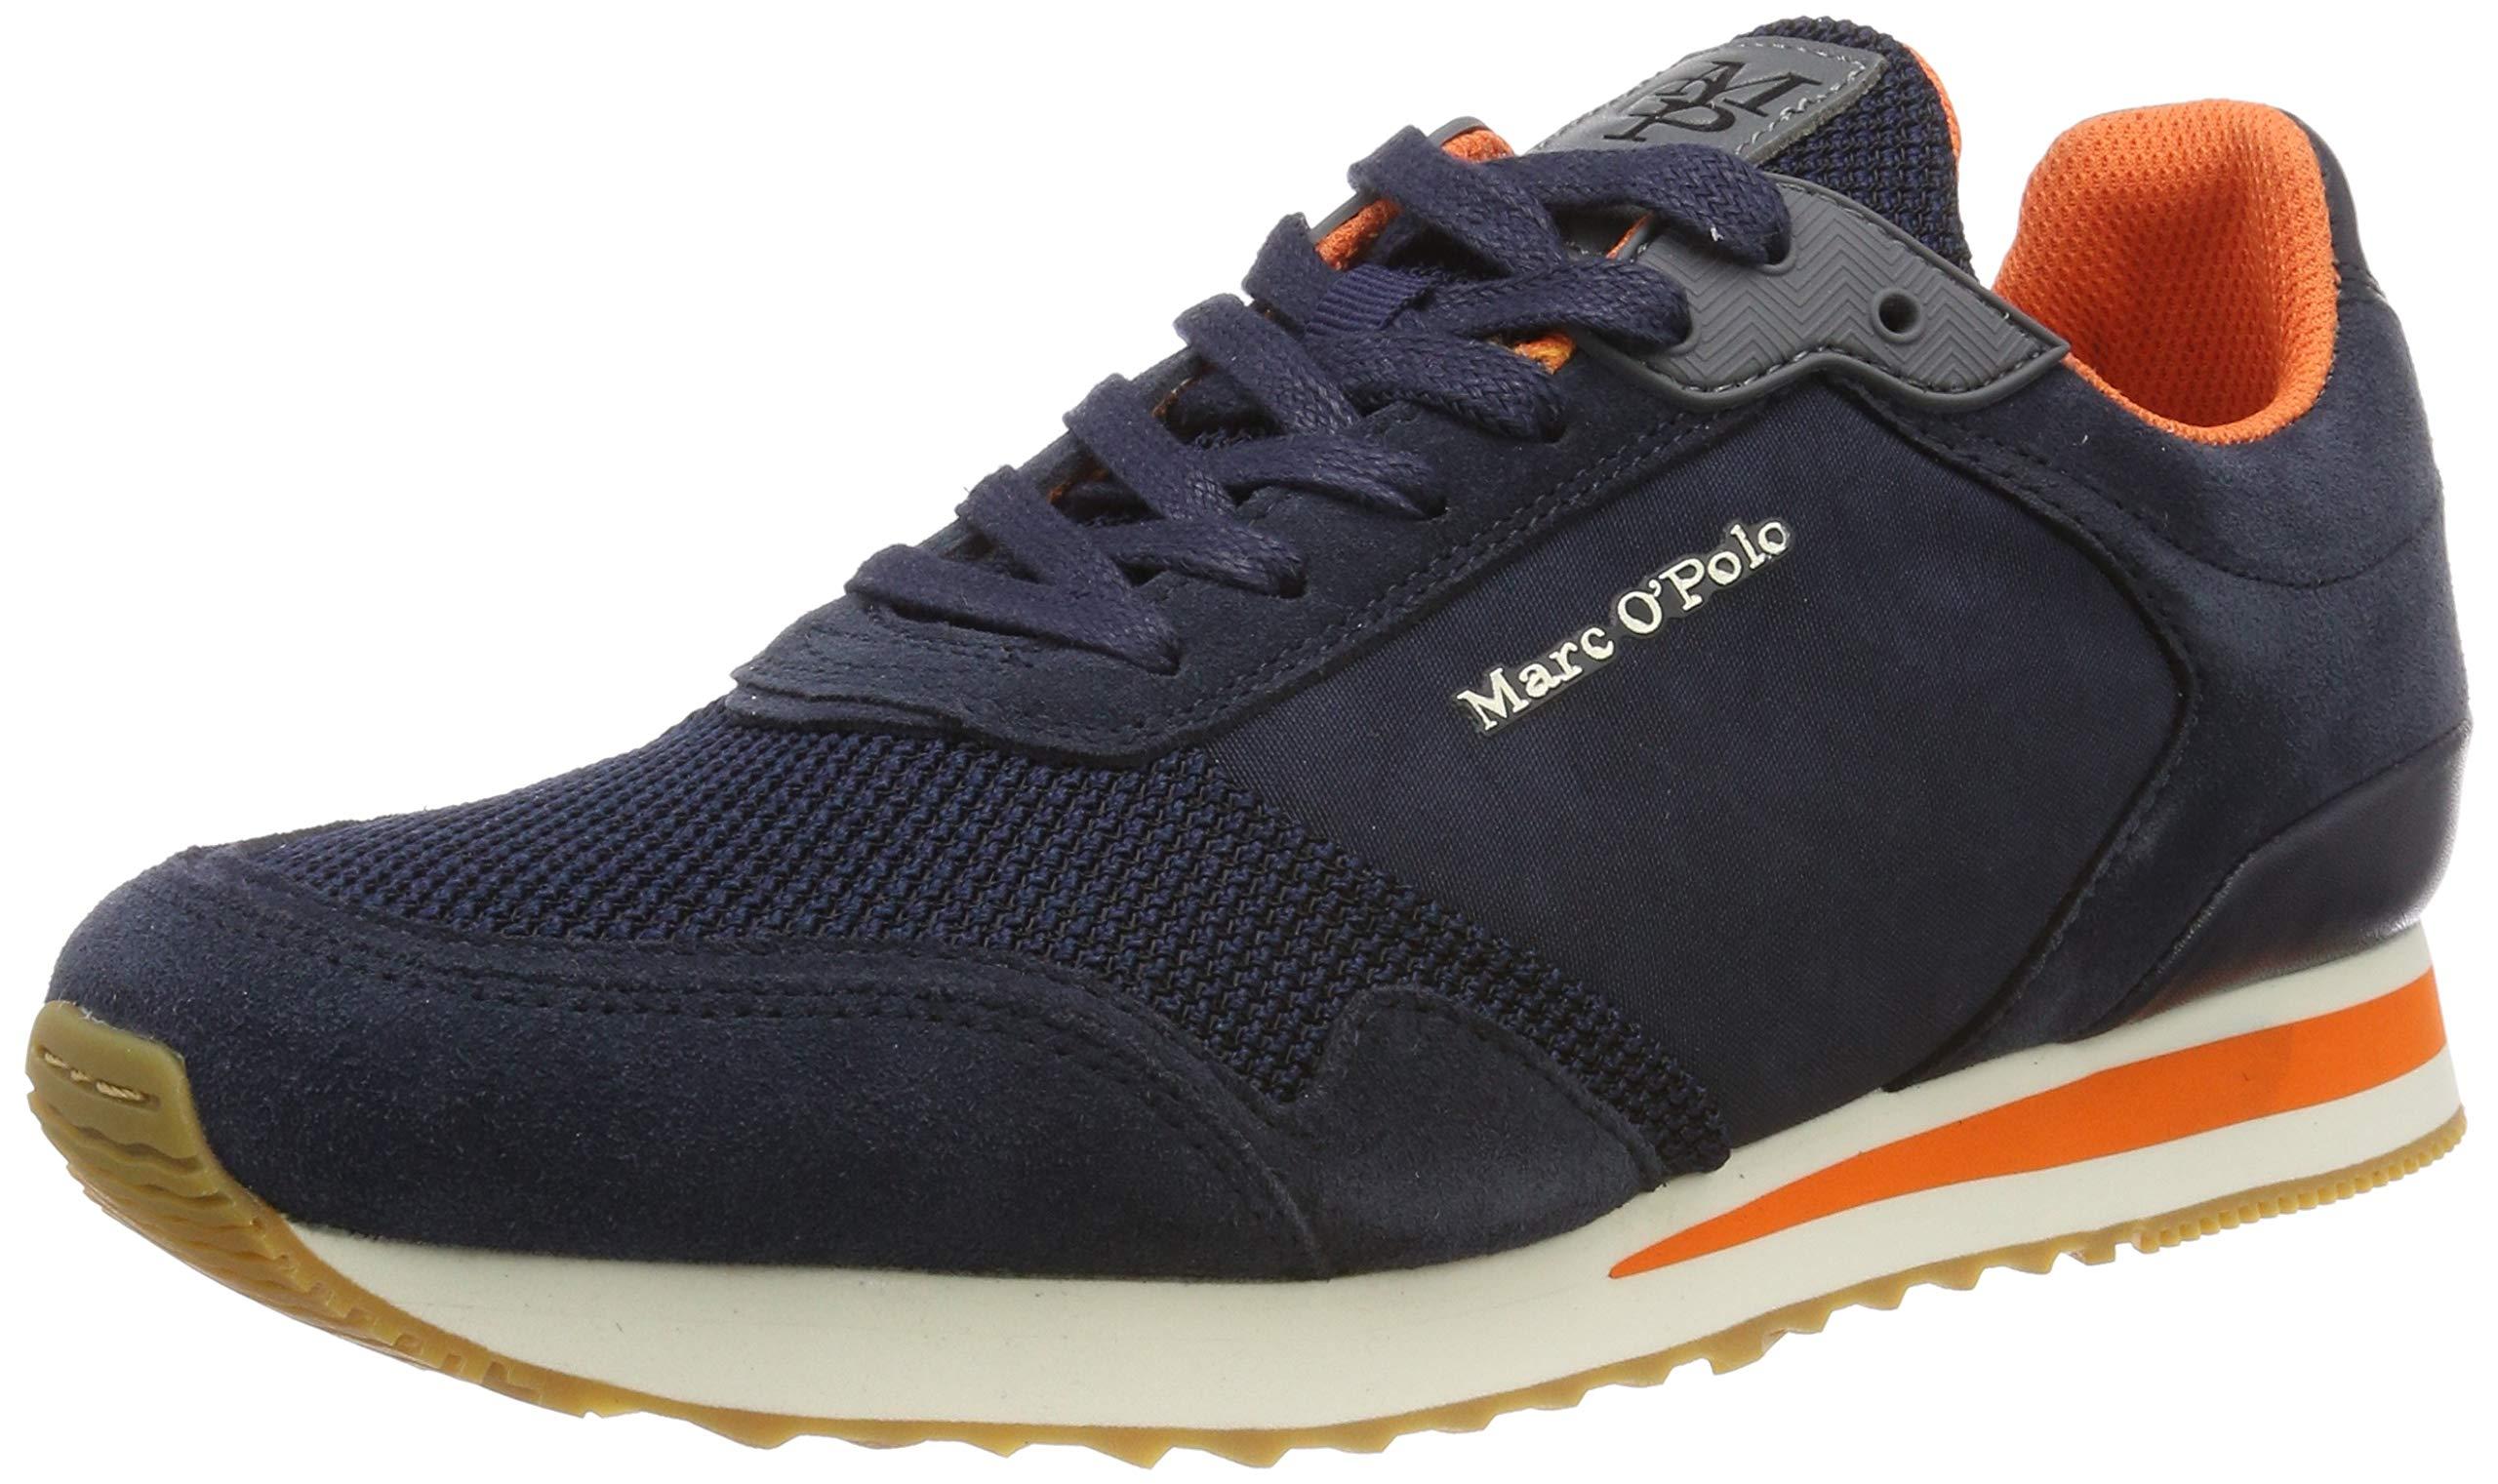 Marc SneakerSneakers Basses HommeBleunavy 89043 O'polo Eu yNO08mvwnP